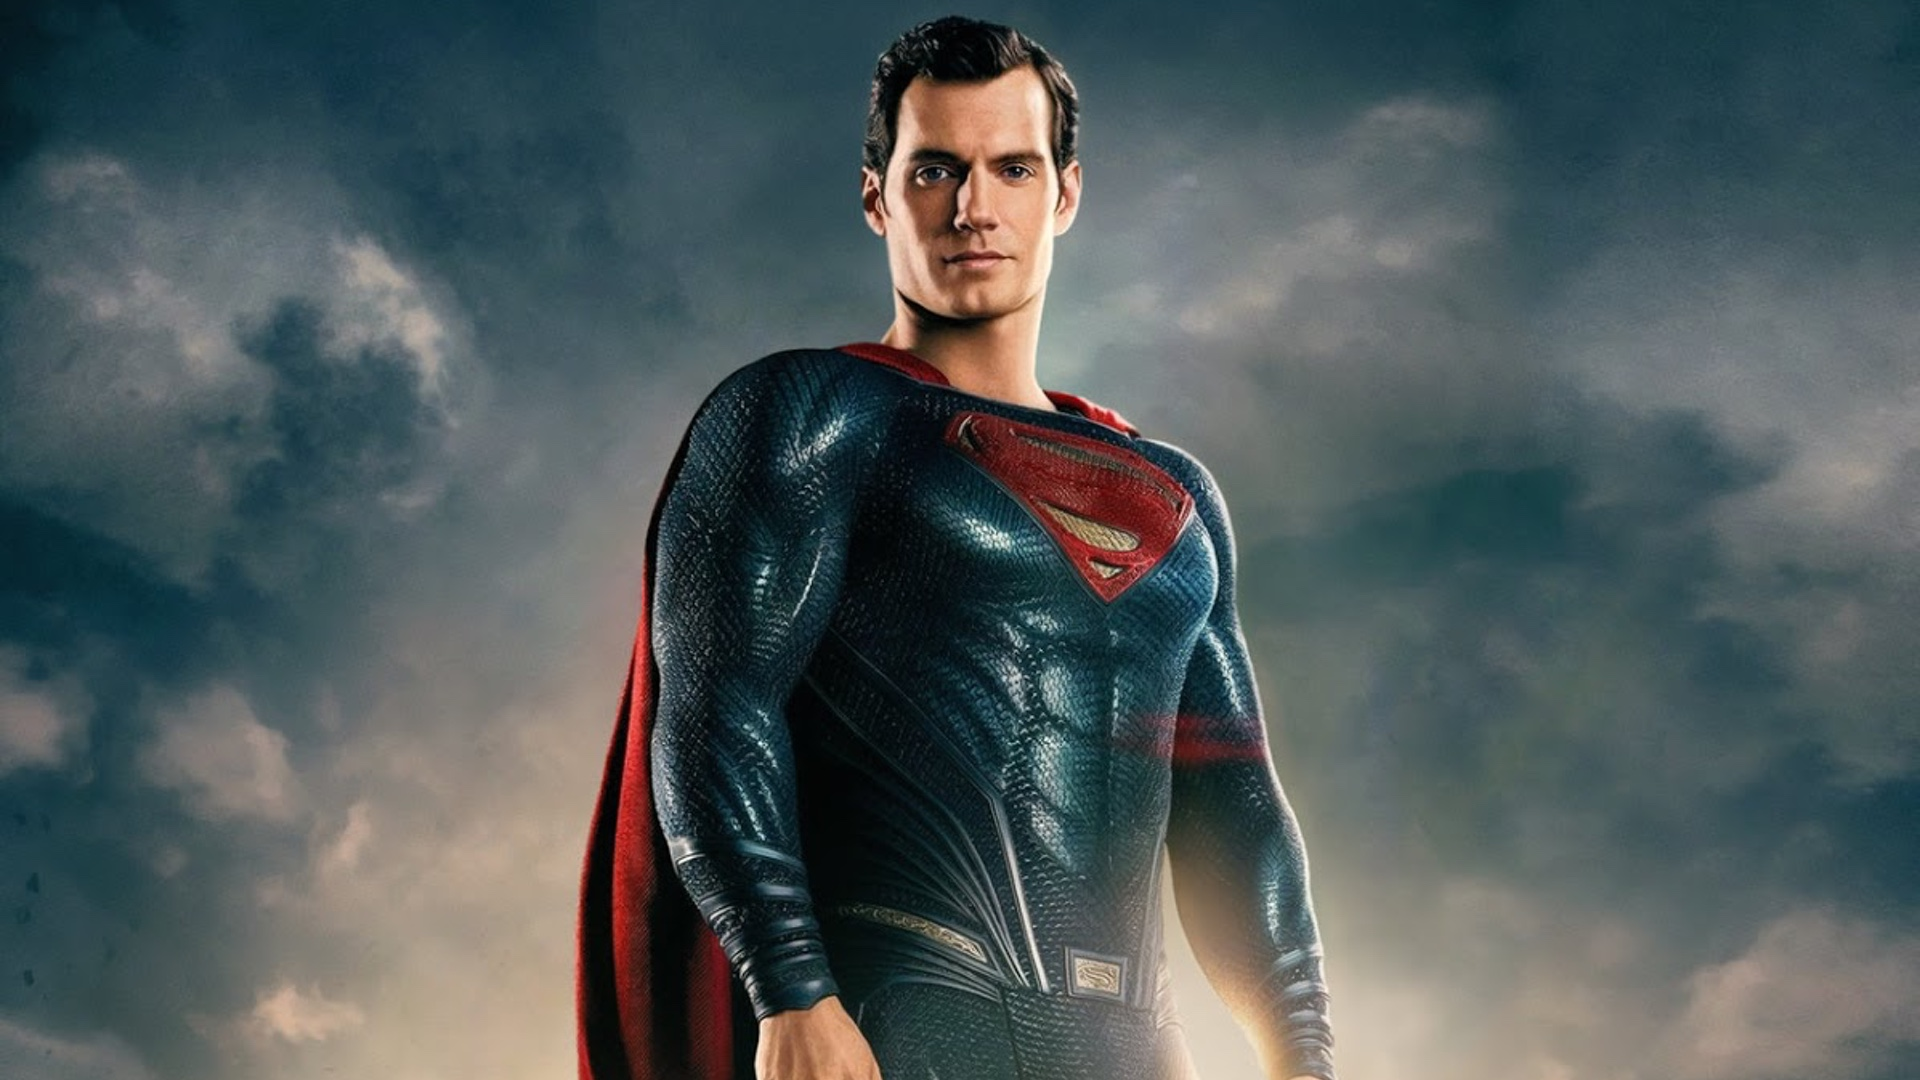 superman henry cavill justice league cinematown.it